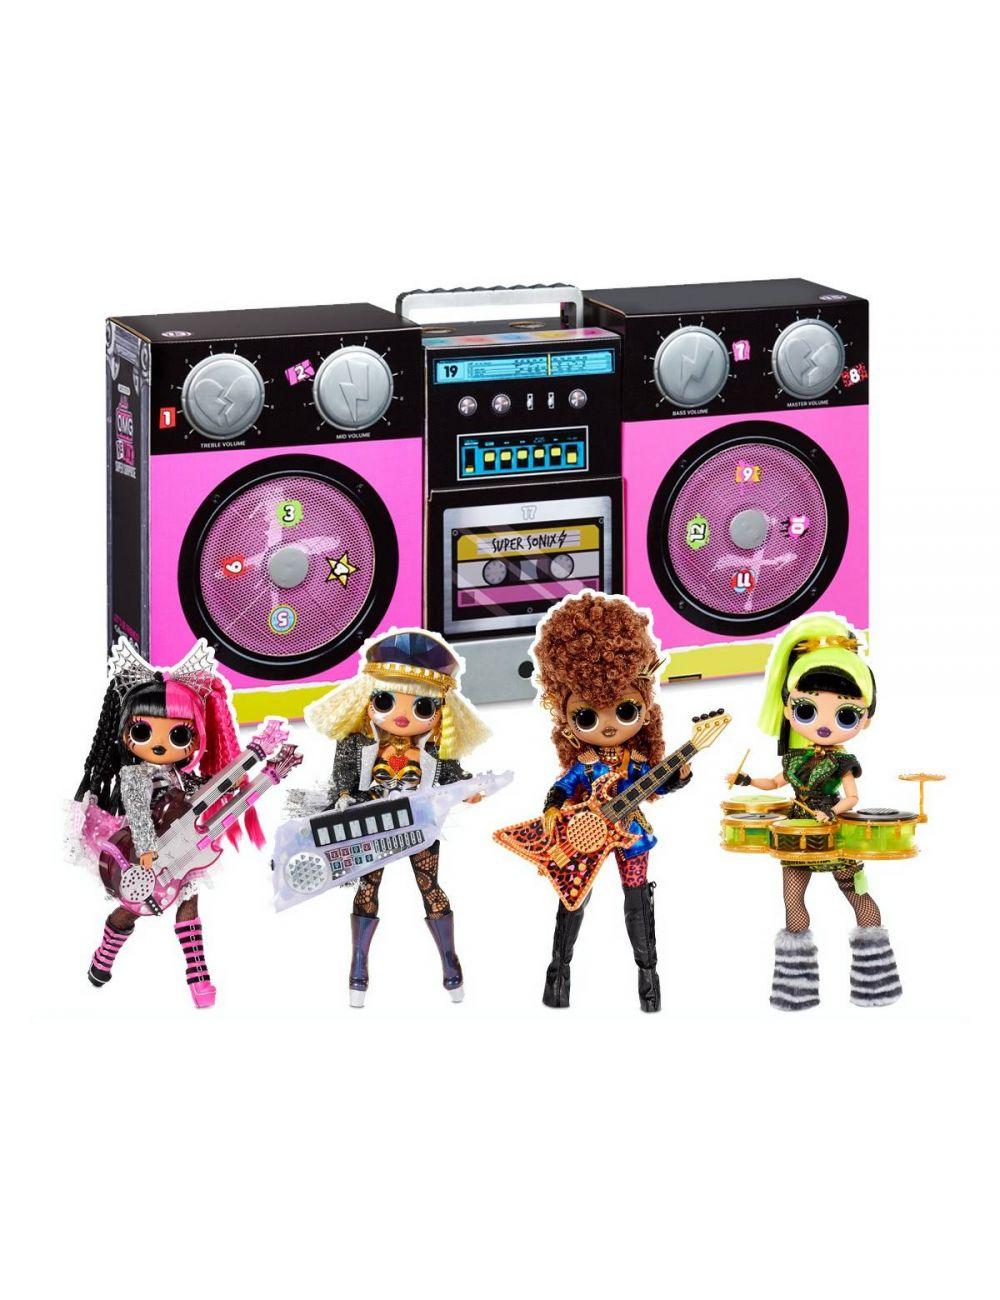 LOL OMG BoomBox Remix Super Surprise 4 lalki 70 niespodzianek 567172